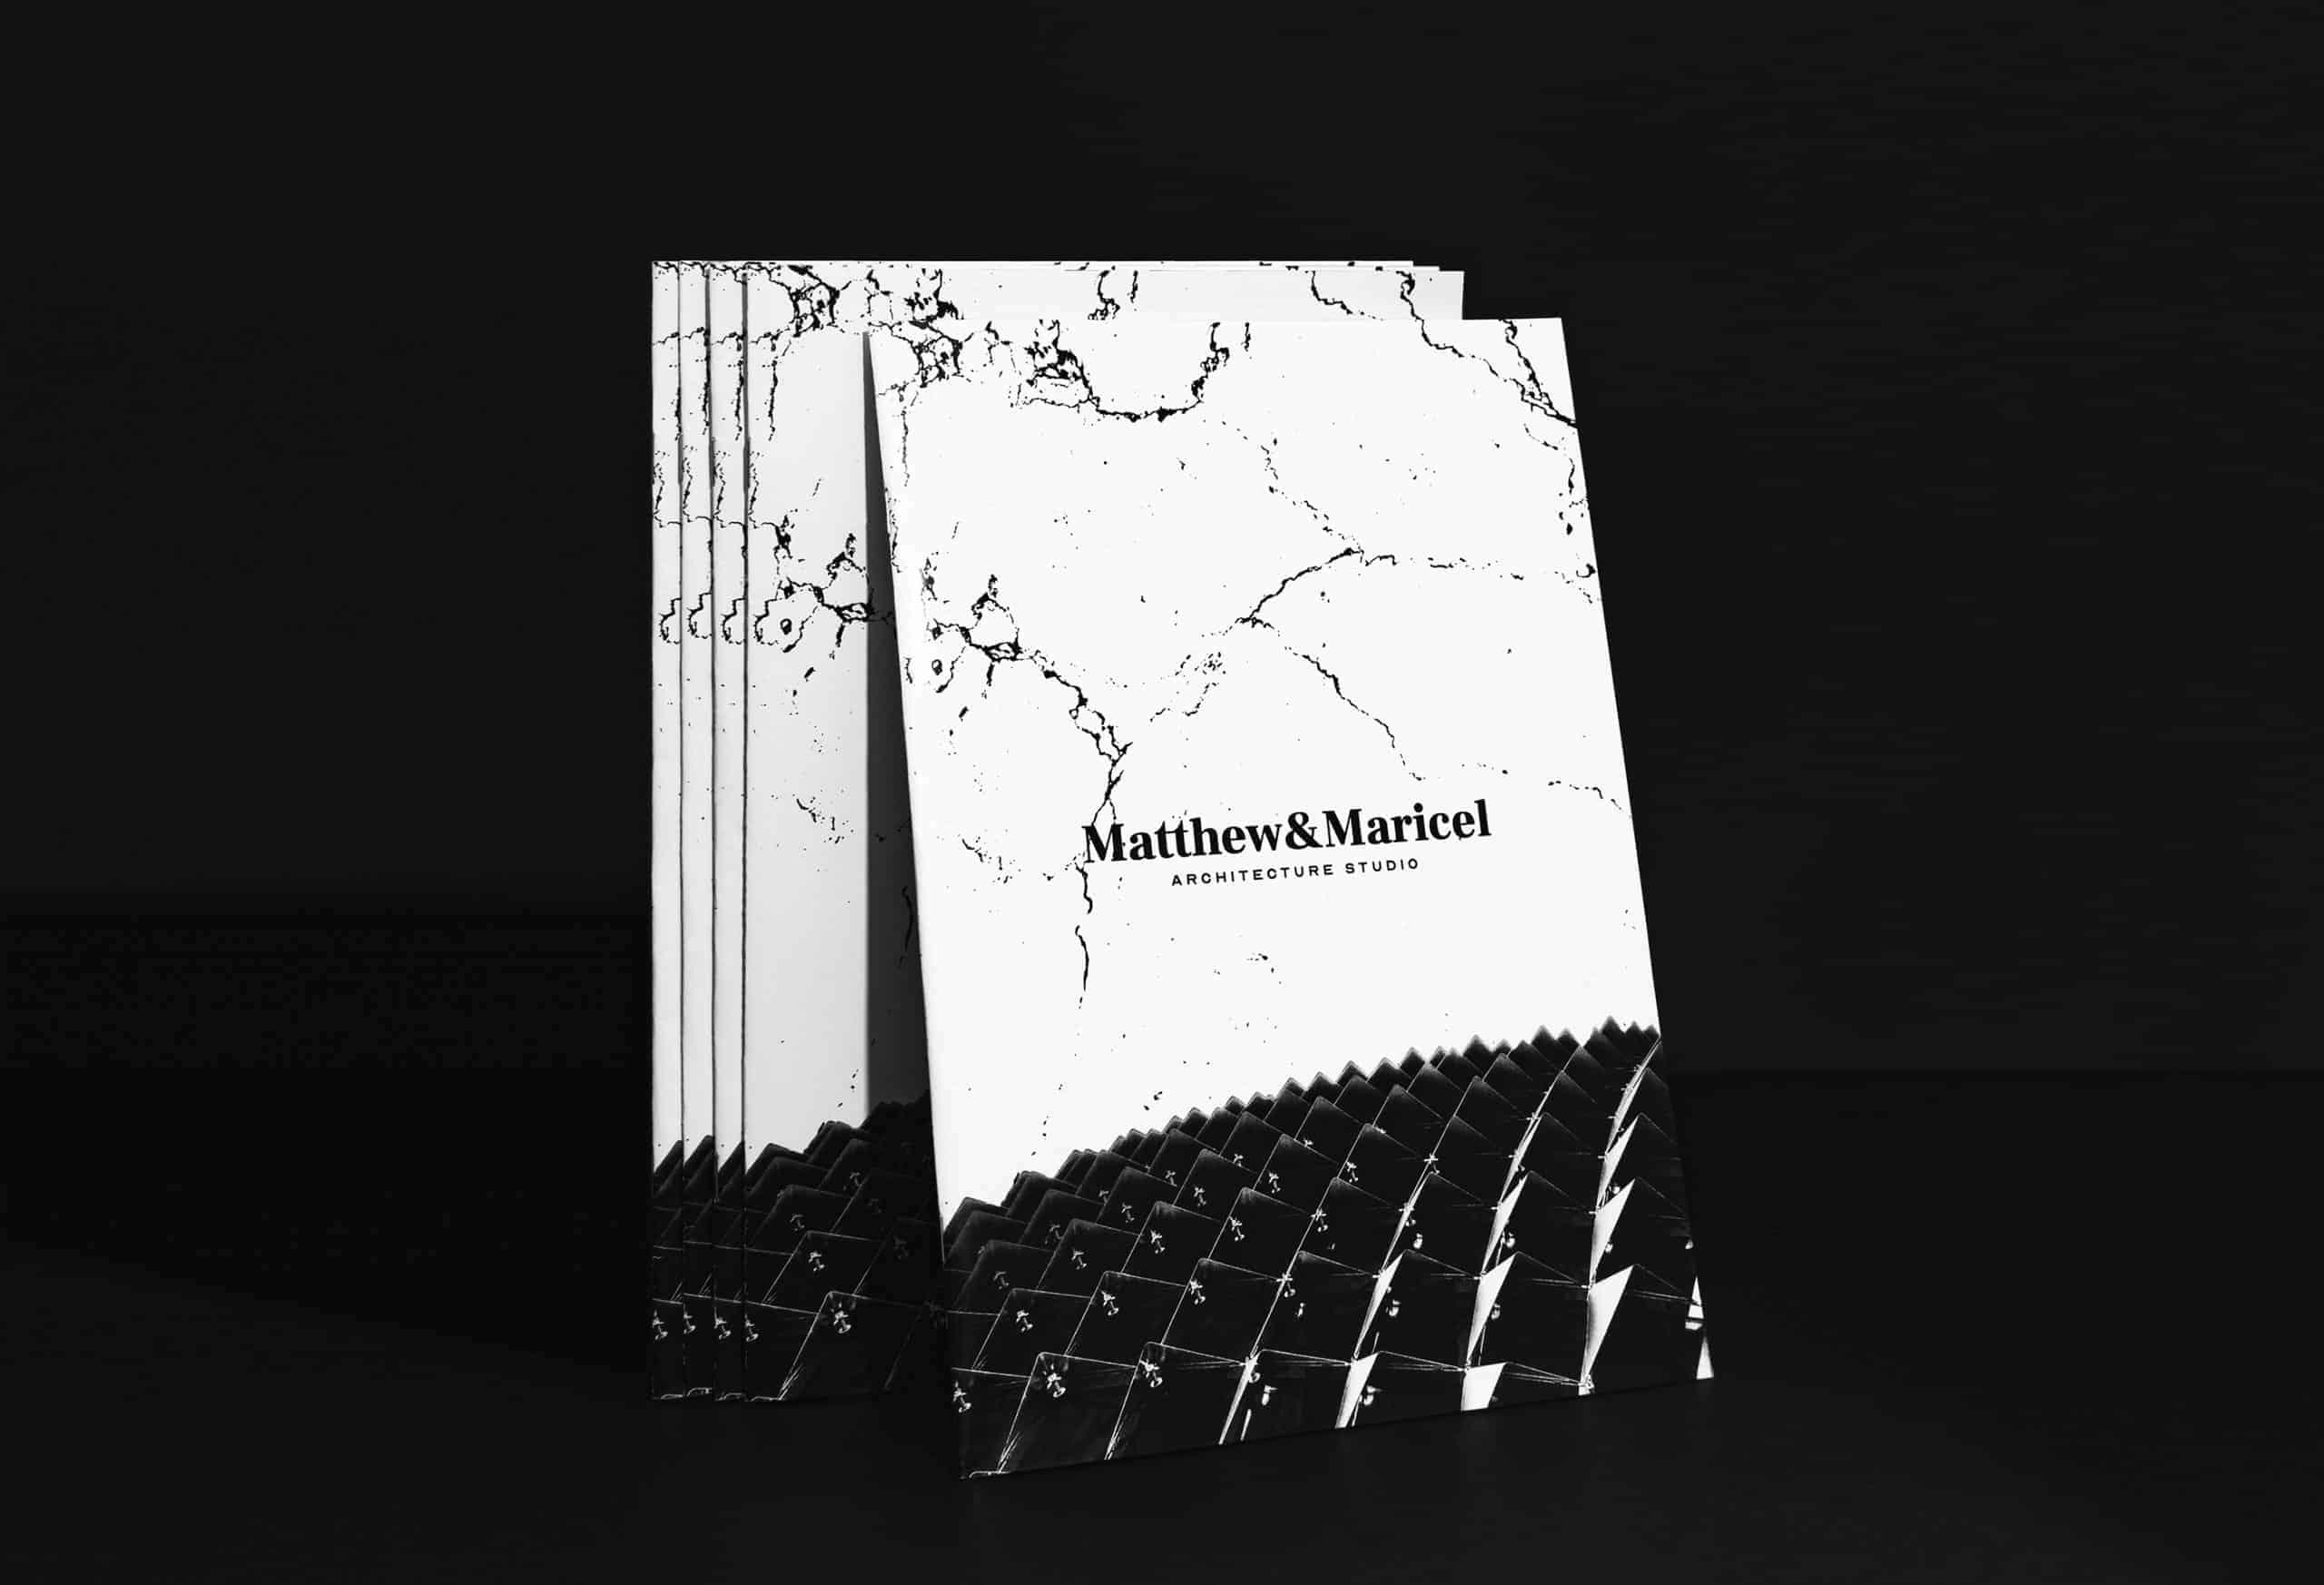 Matthew&Maricel Architecture Studio